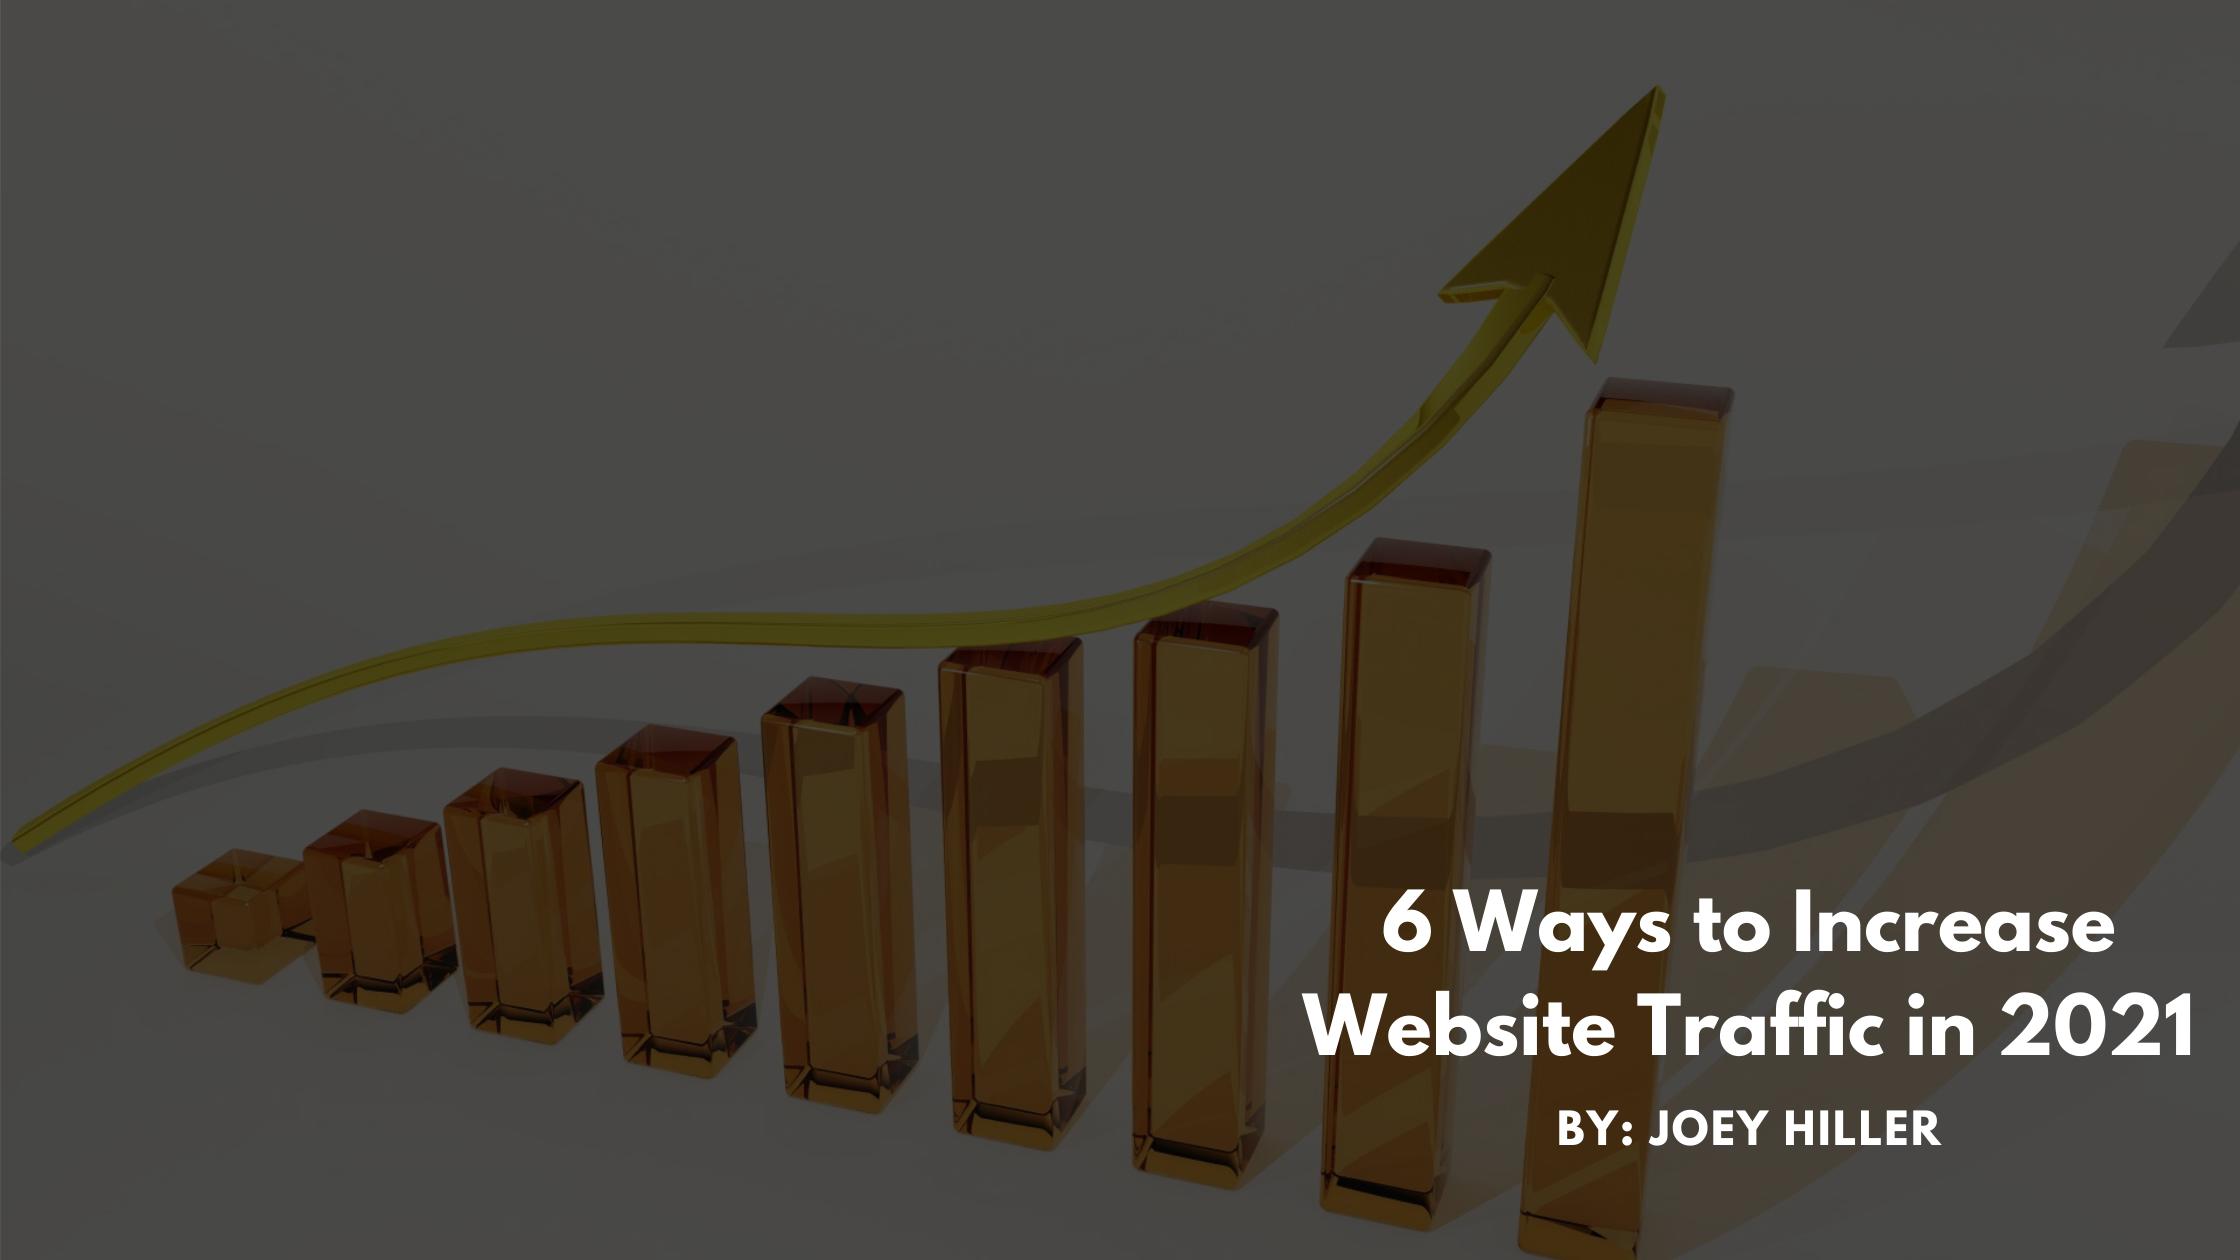 6 Ways to Increase Website Traffic in 2021